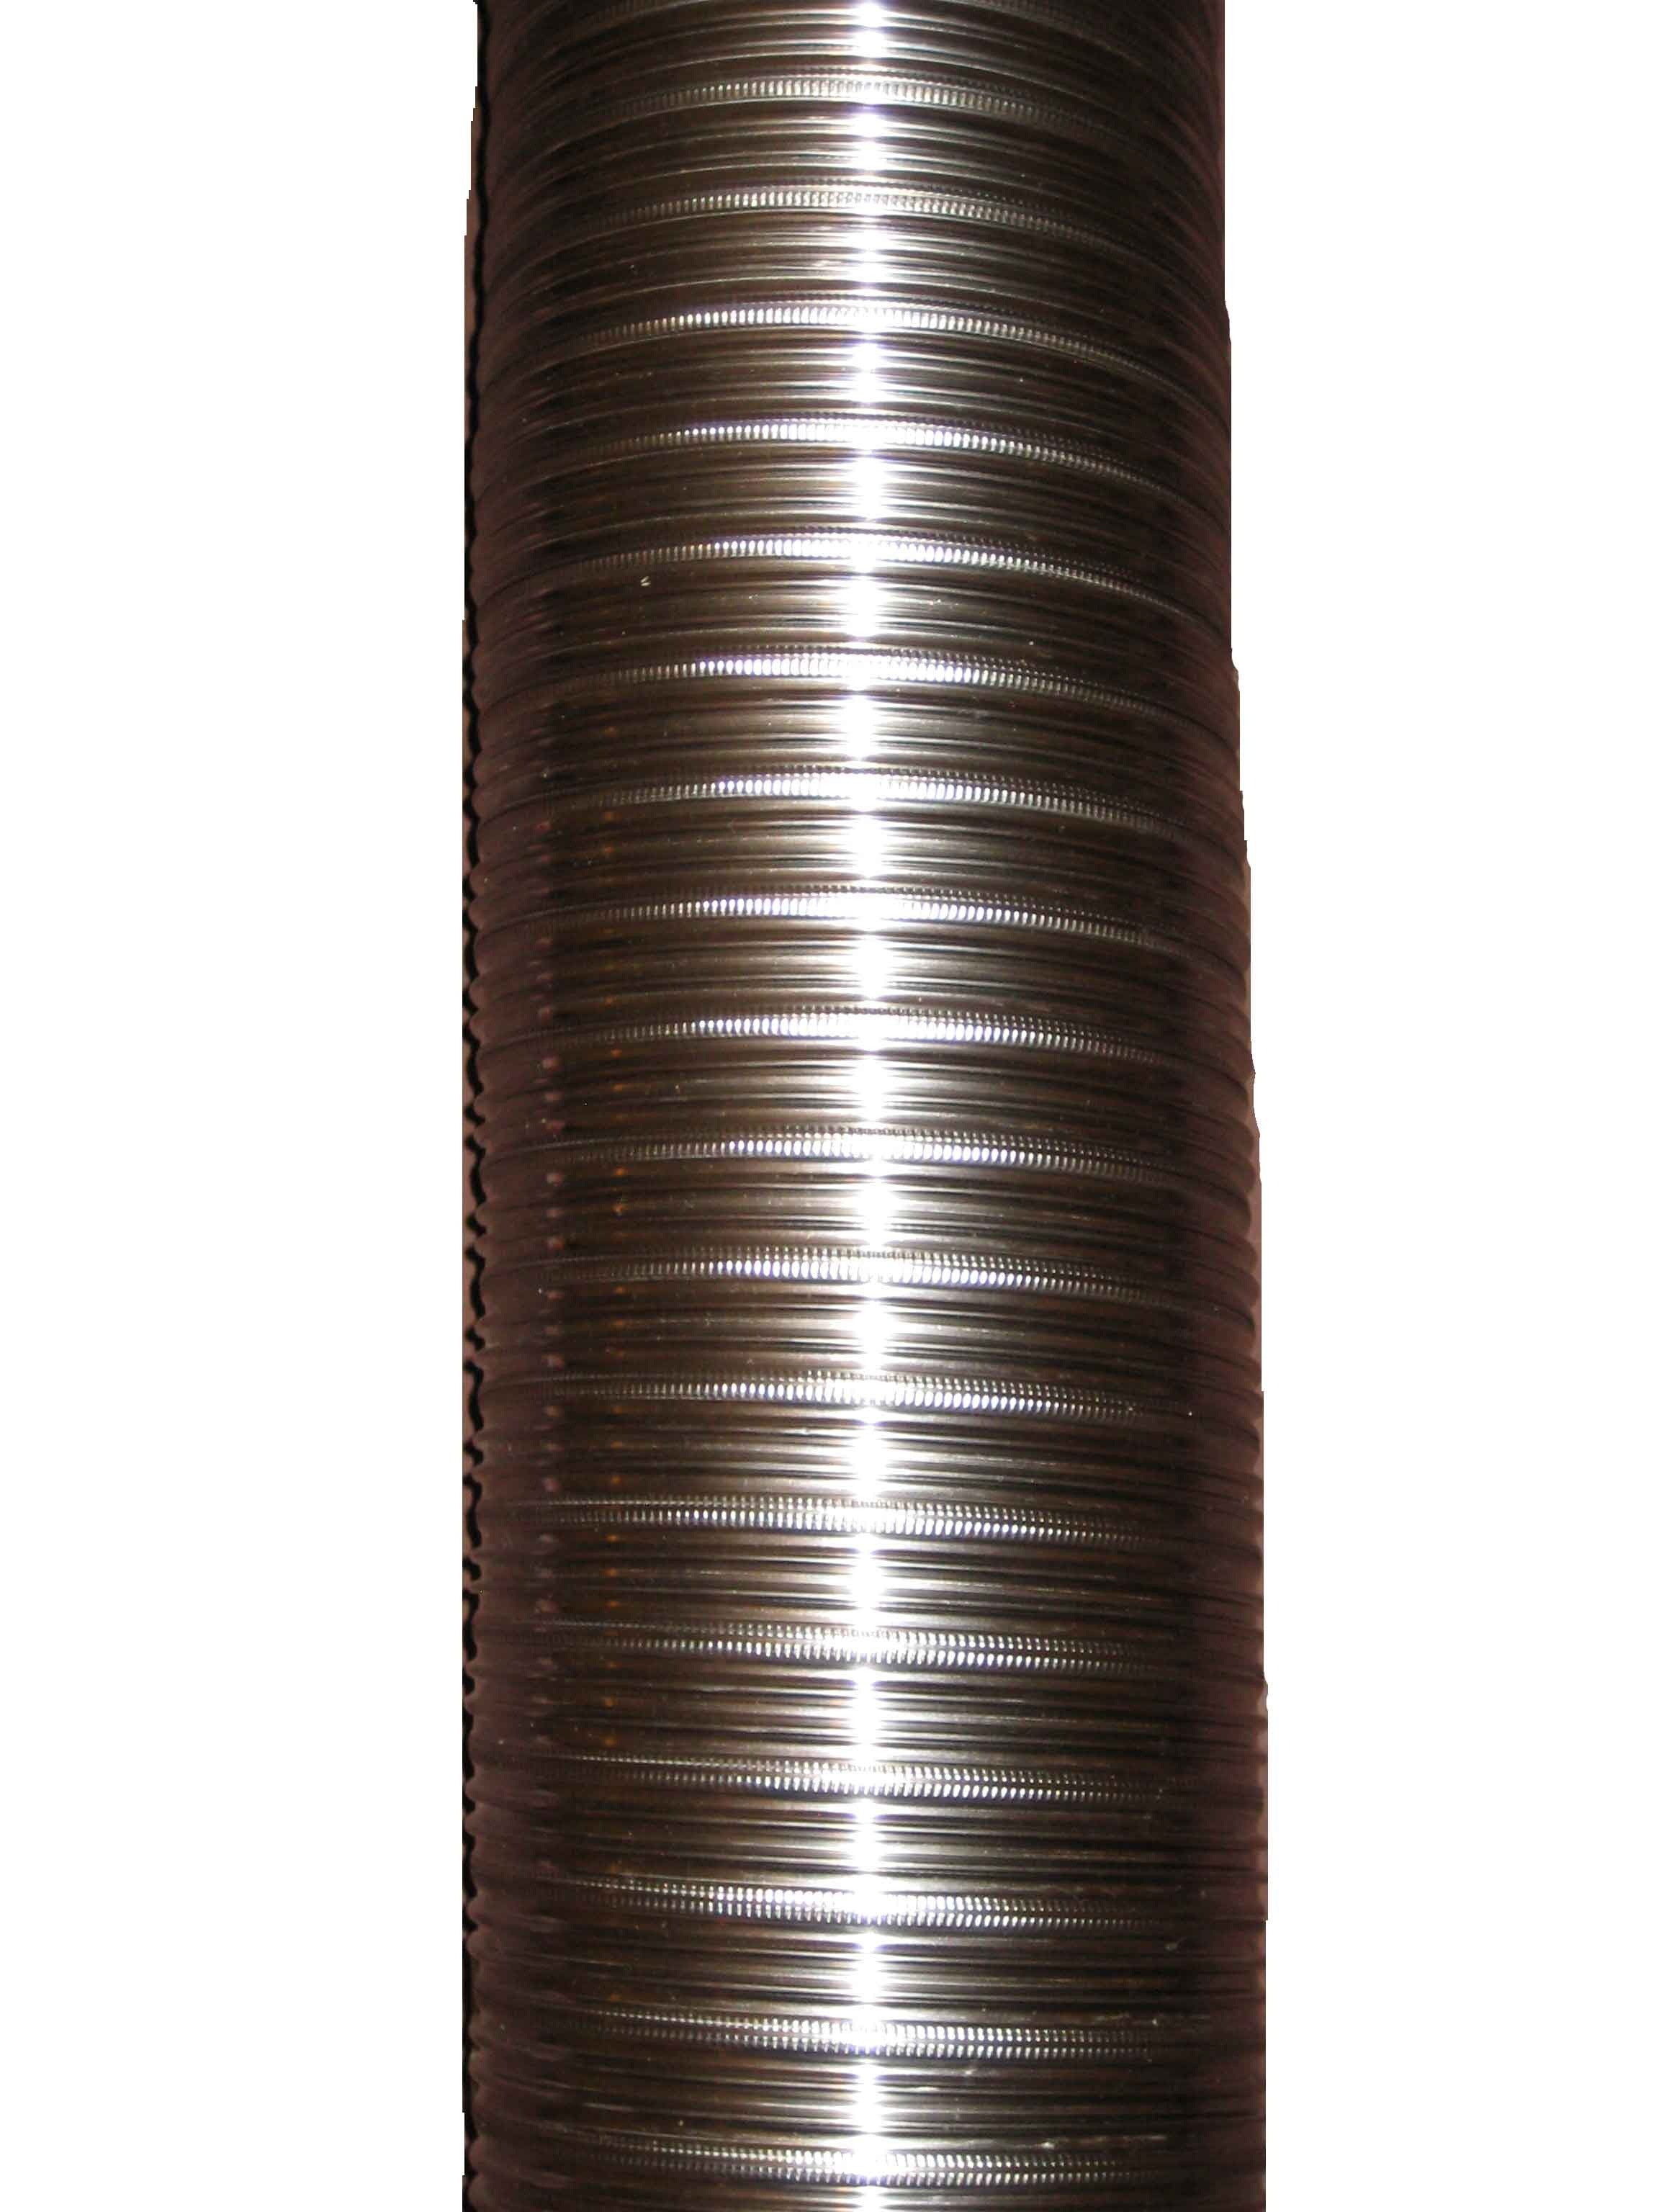 6m 150mm 316/316 Twin Wall Flexible Flue Liner